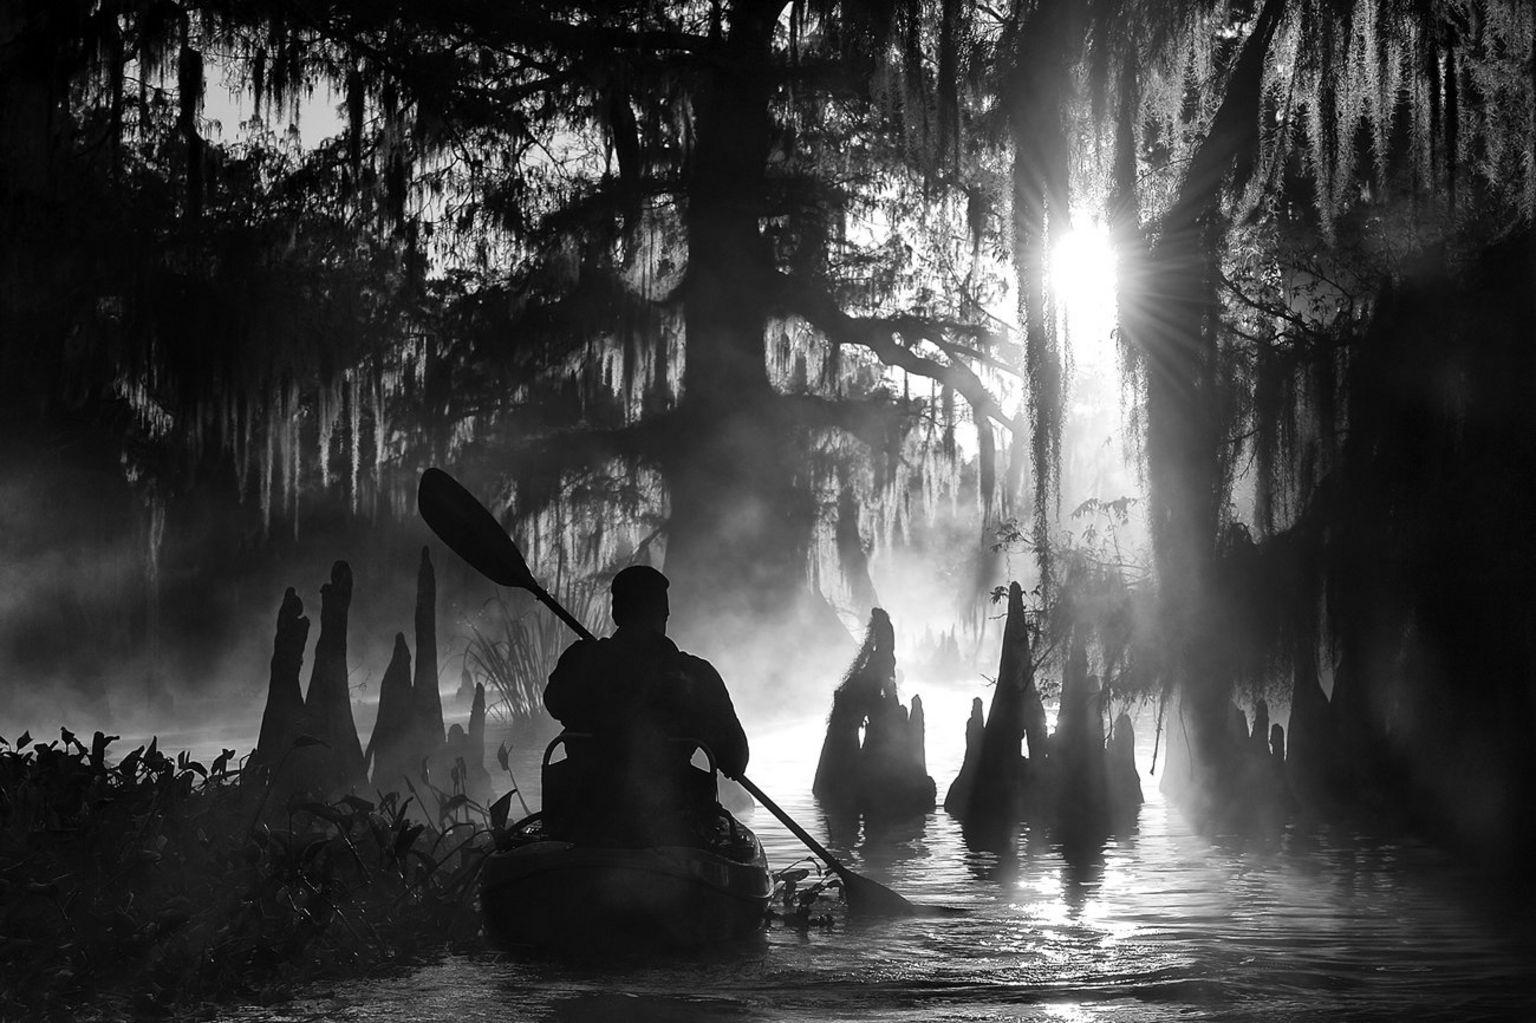 Kayaking - Atchafalaya Basin, Louisiana, USA